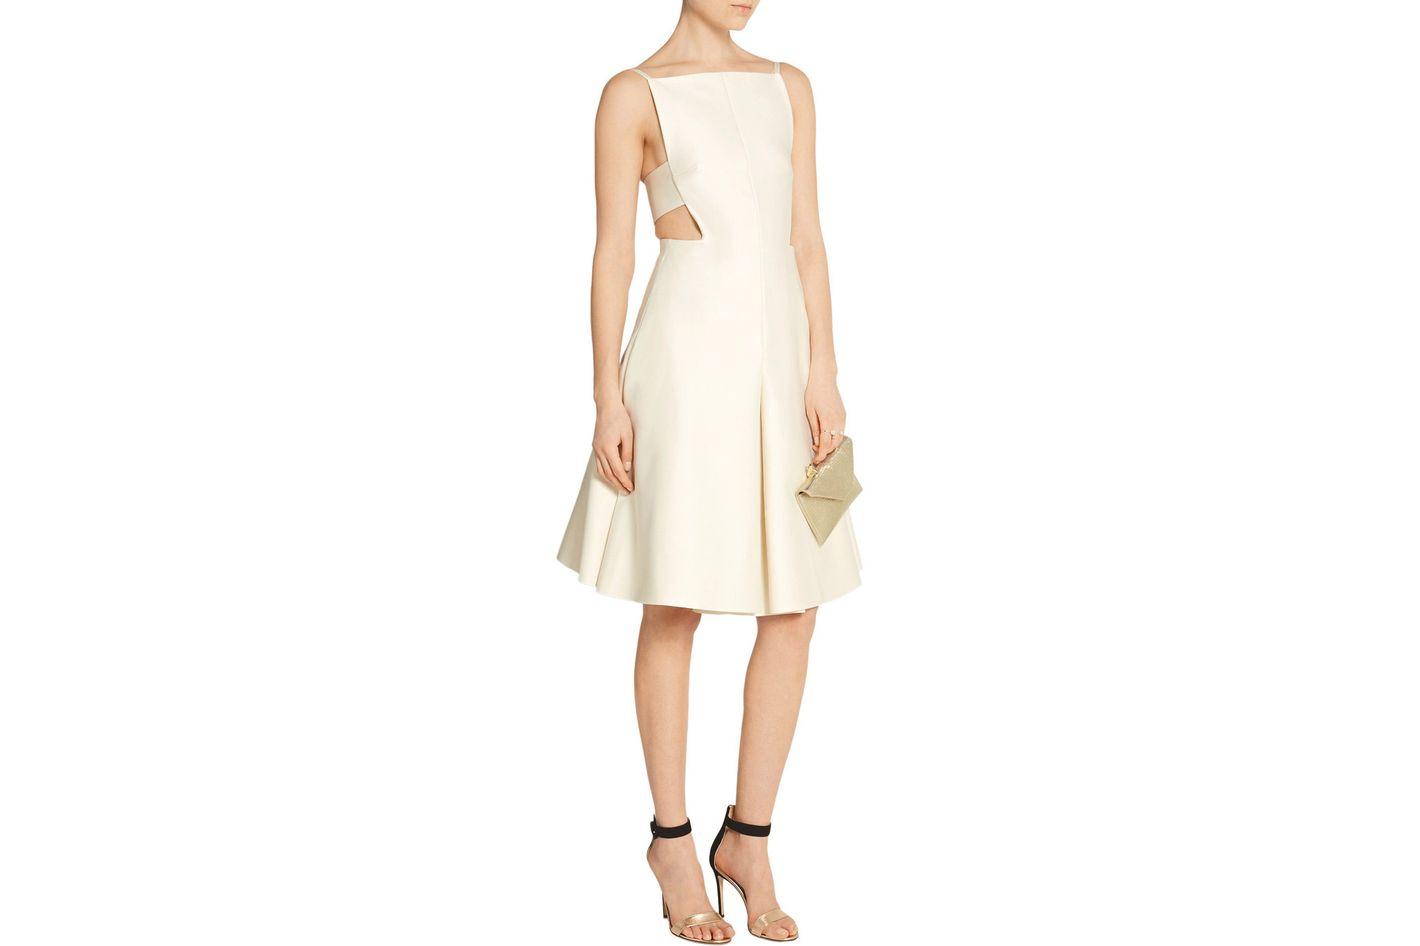 Solace London Ava cutout satin-crepe dress